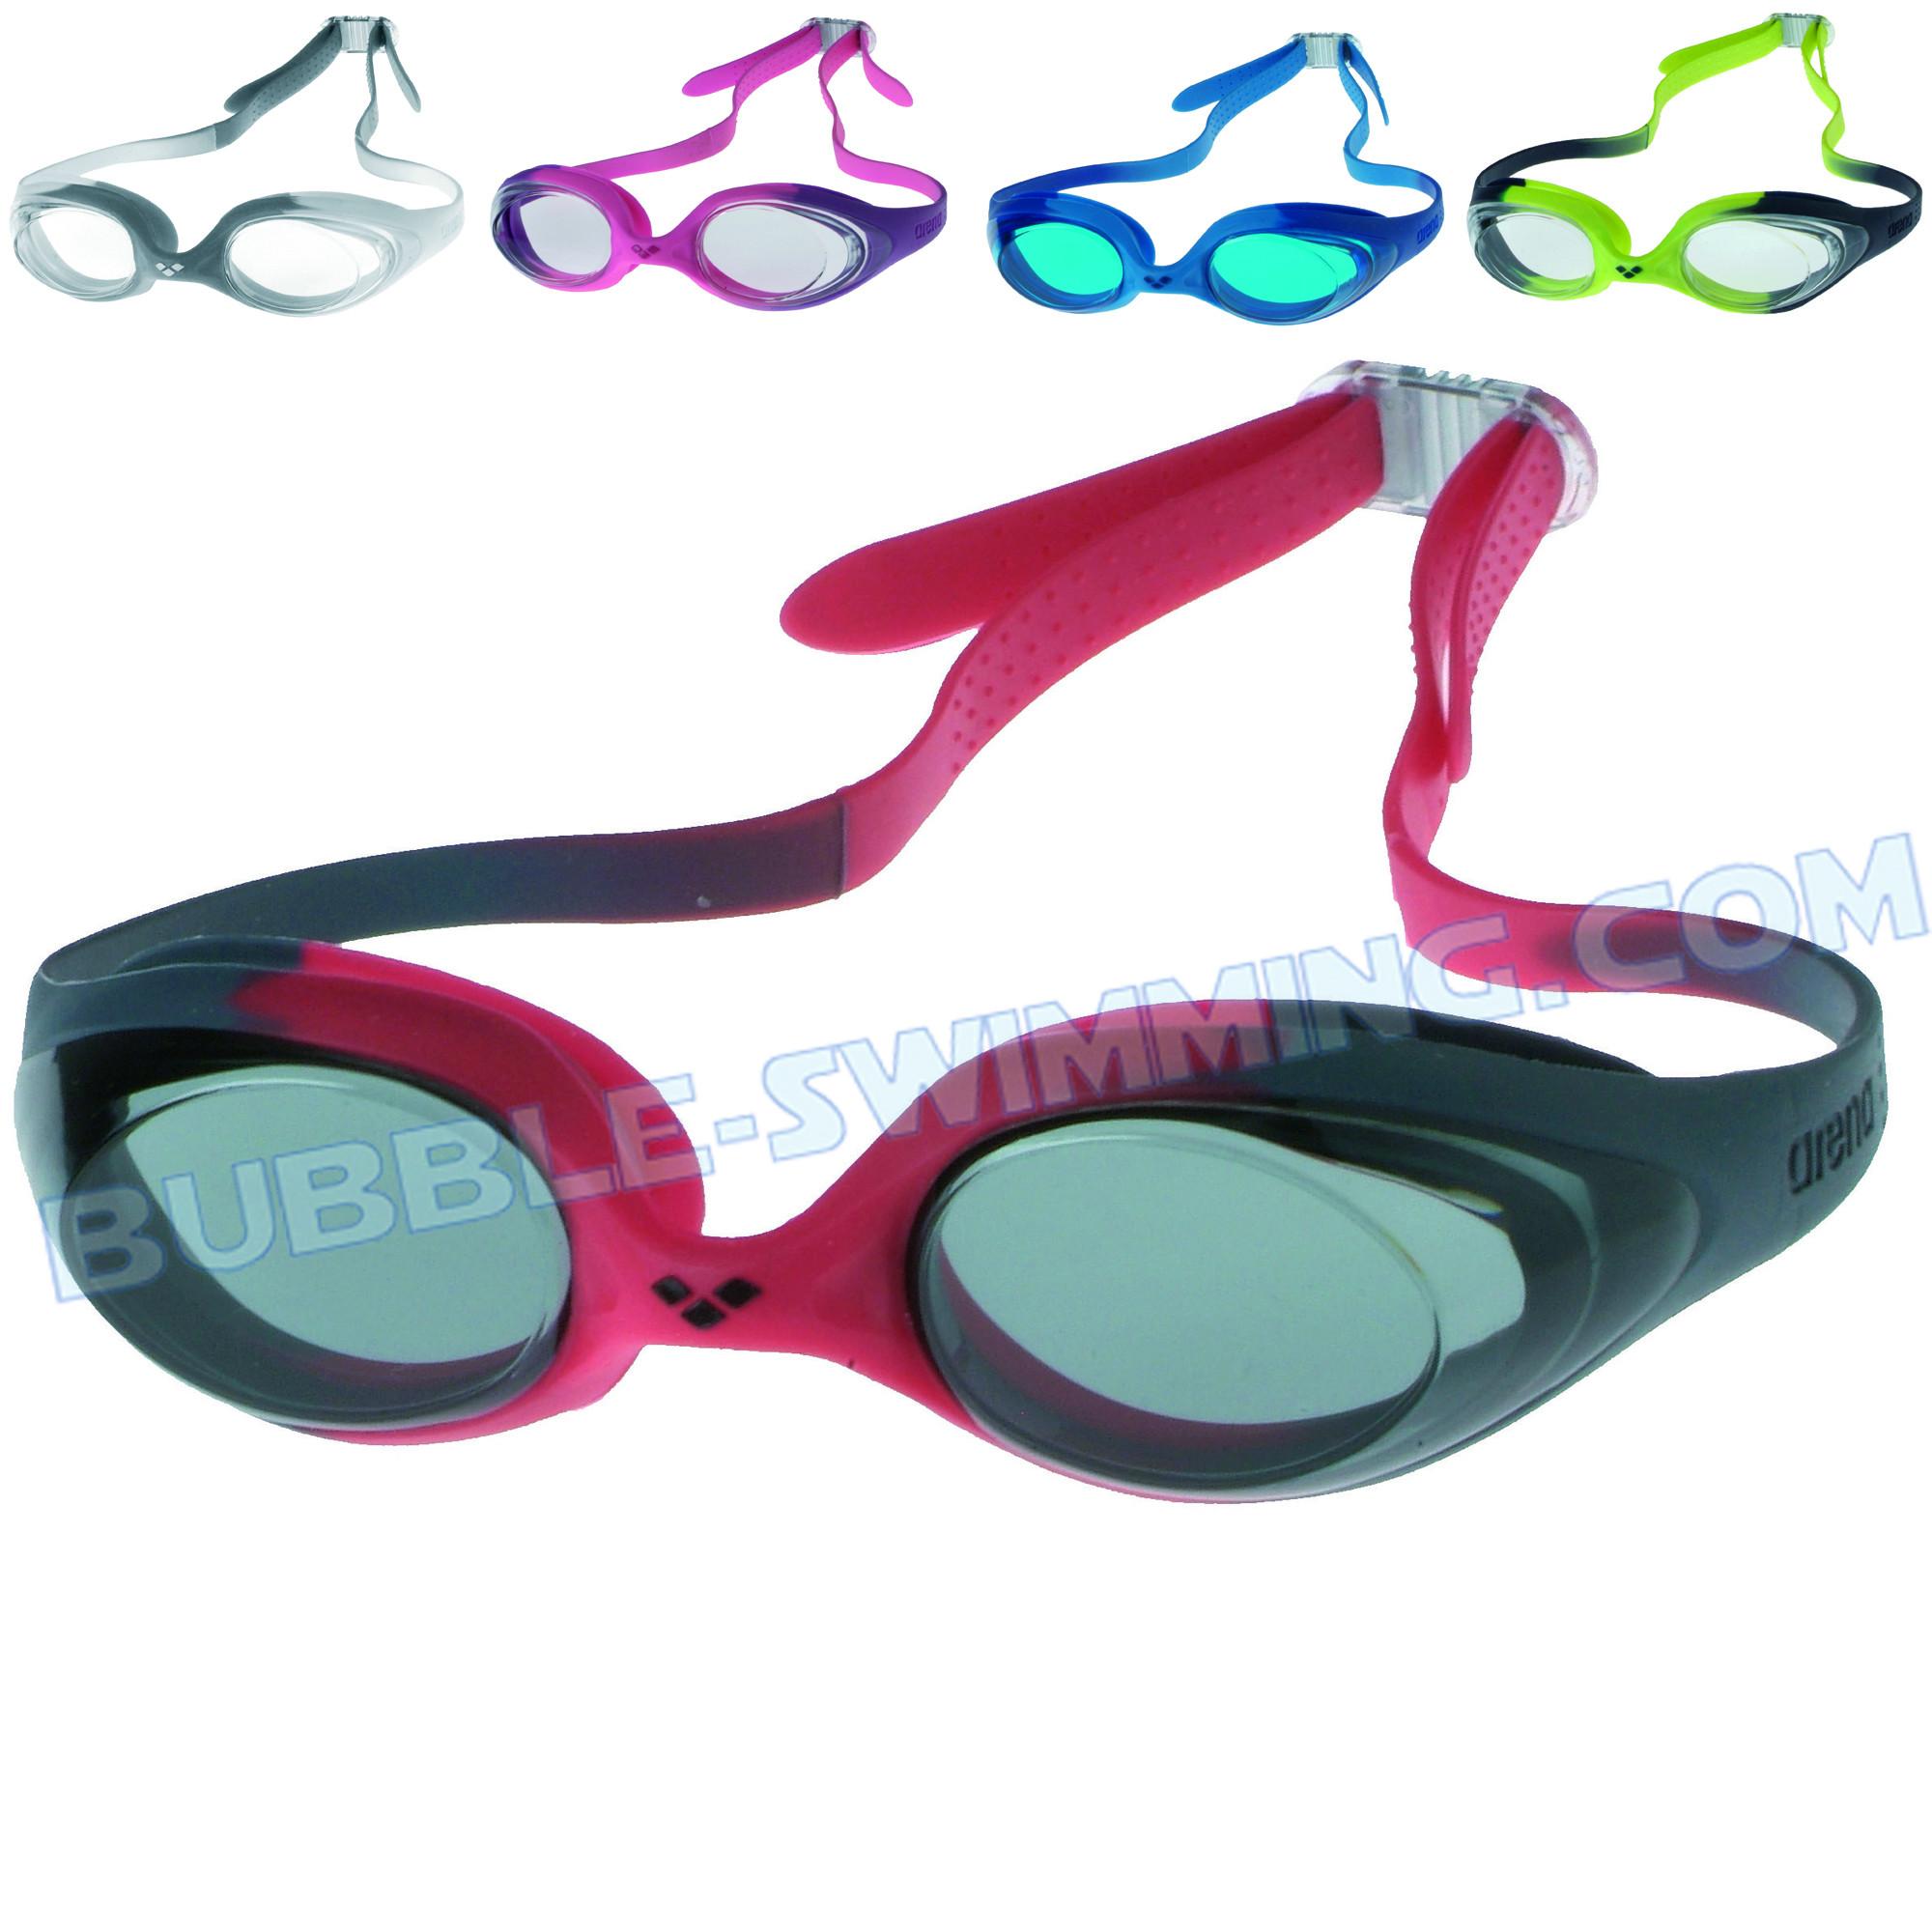 Lunettes spider junior lunette enfant piscine lunettes - Lunettes de piscine correctrices ...